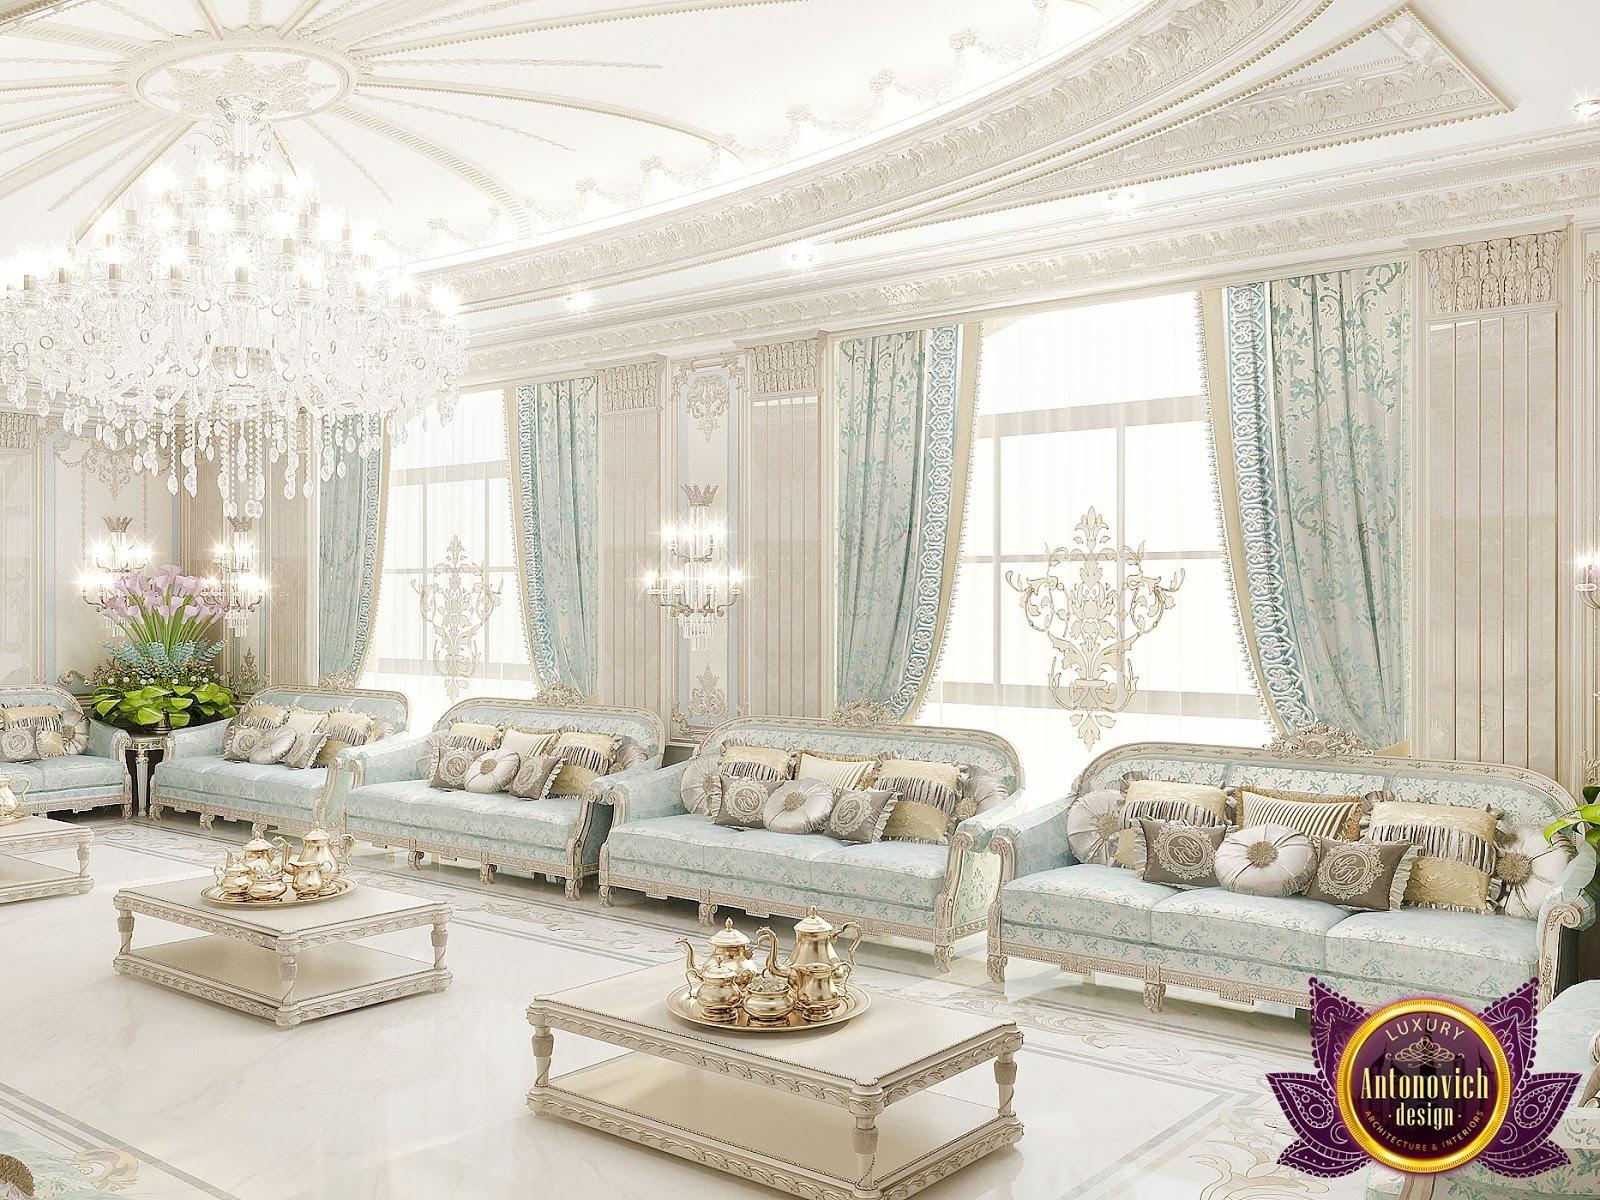 Kitchen Design Usa By Katrina Antonovich: Kenyadesign: The Best Interior Design Majlis By Katrina